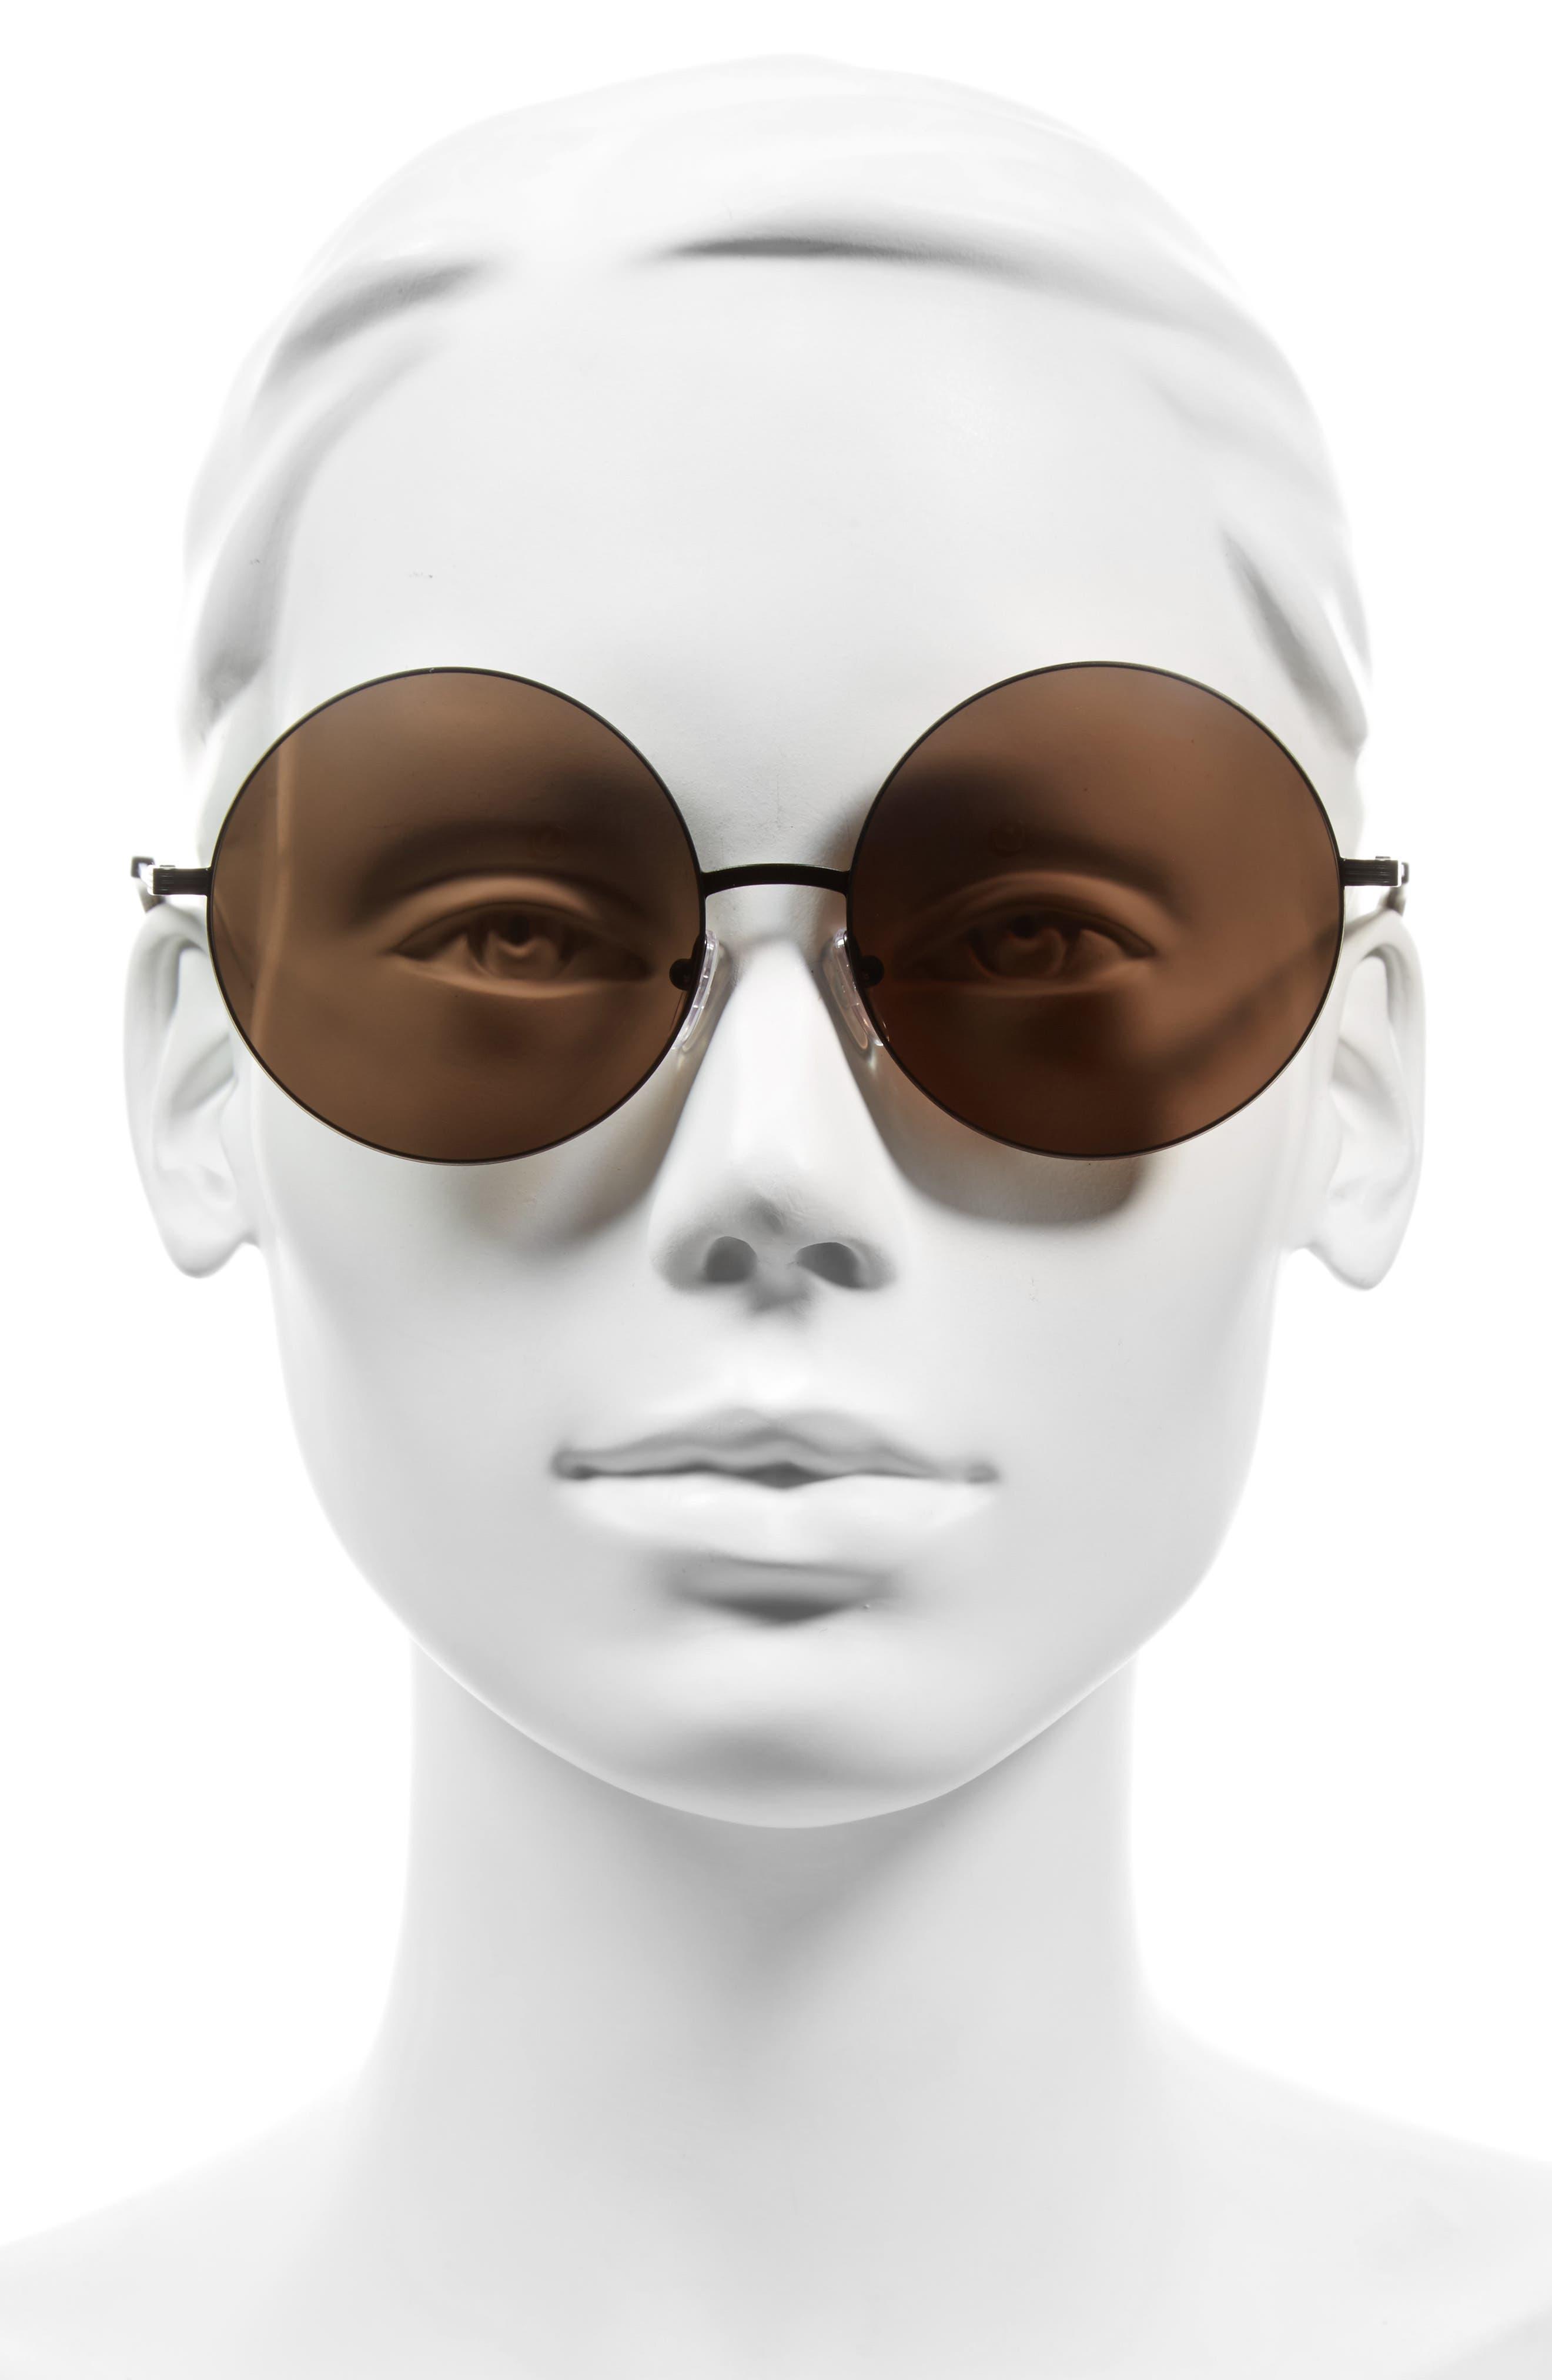 VICTORIA BECKHAM, Feather 58mm Round Sunglasses, Alternate thumbnail 2, color, BLACK/ CAVIAR MIRROR